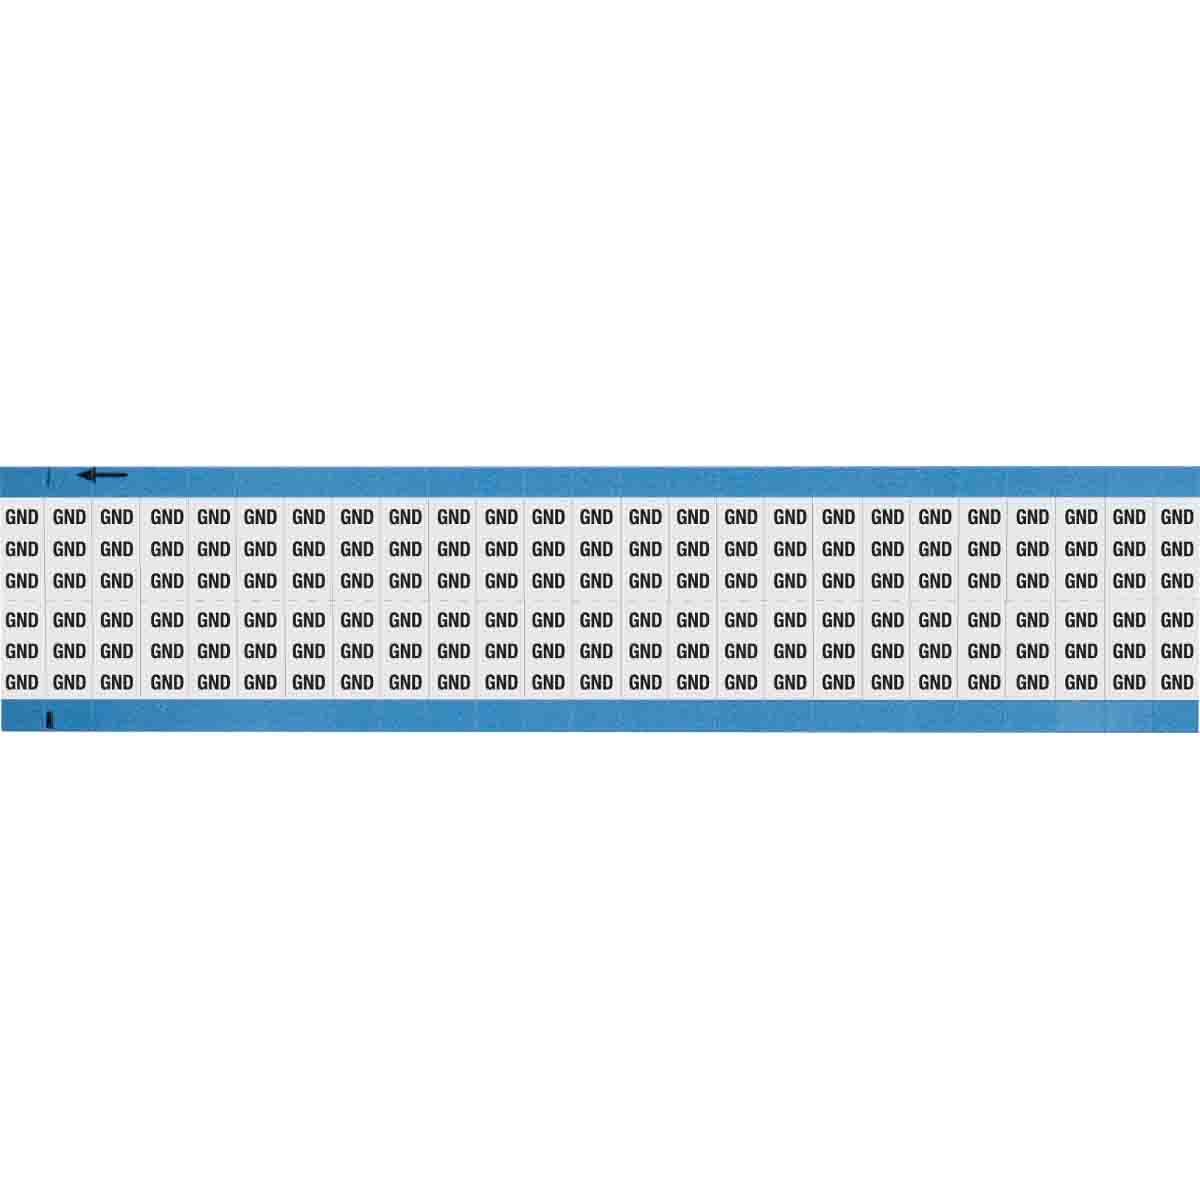 B-500 Machine Tool Symbol Wire Marker Card Black on White 25 Cards Brady WM-1T3-PK Repositionable Vinyl Cloth